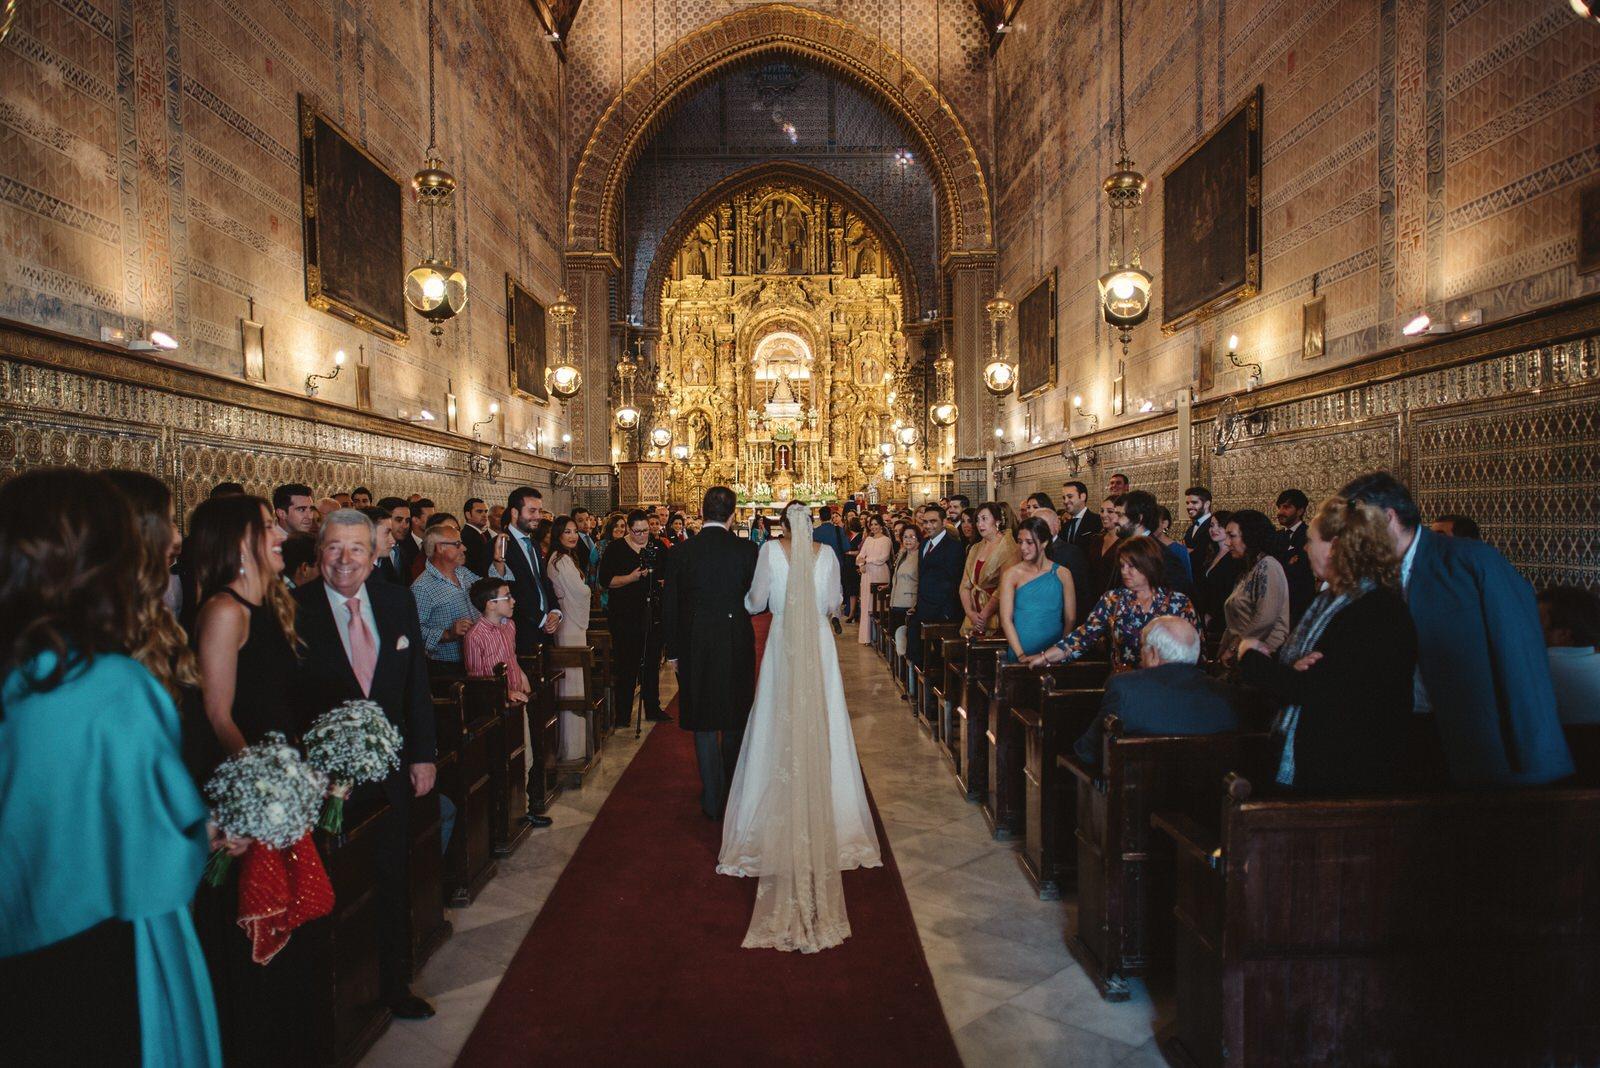 fotografo de bodas sevilla - fotografo boda - fotografía sevilla - Andrés AmarilloAAA_2965- fine.JPG